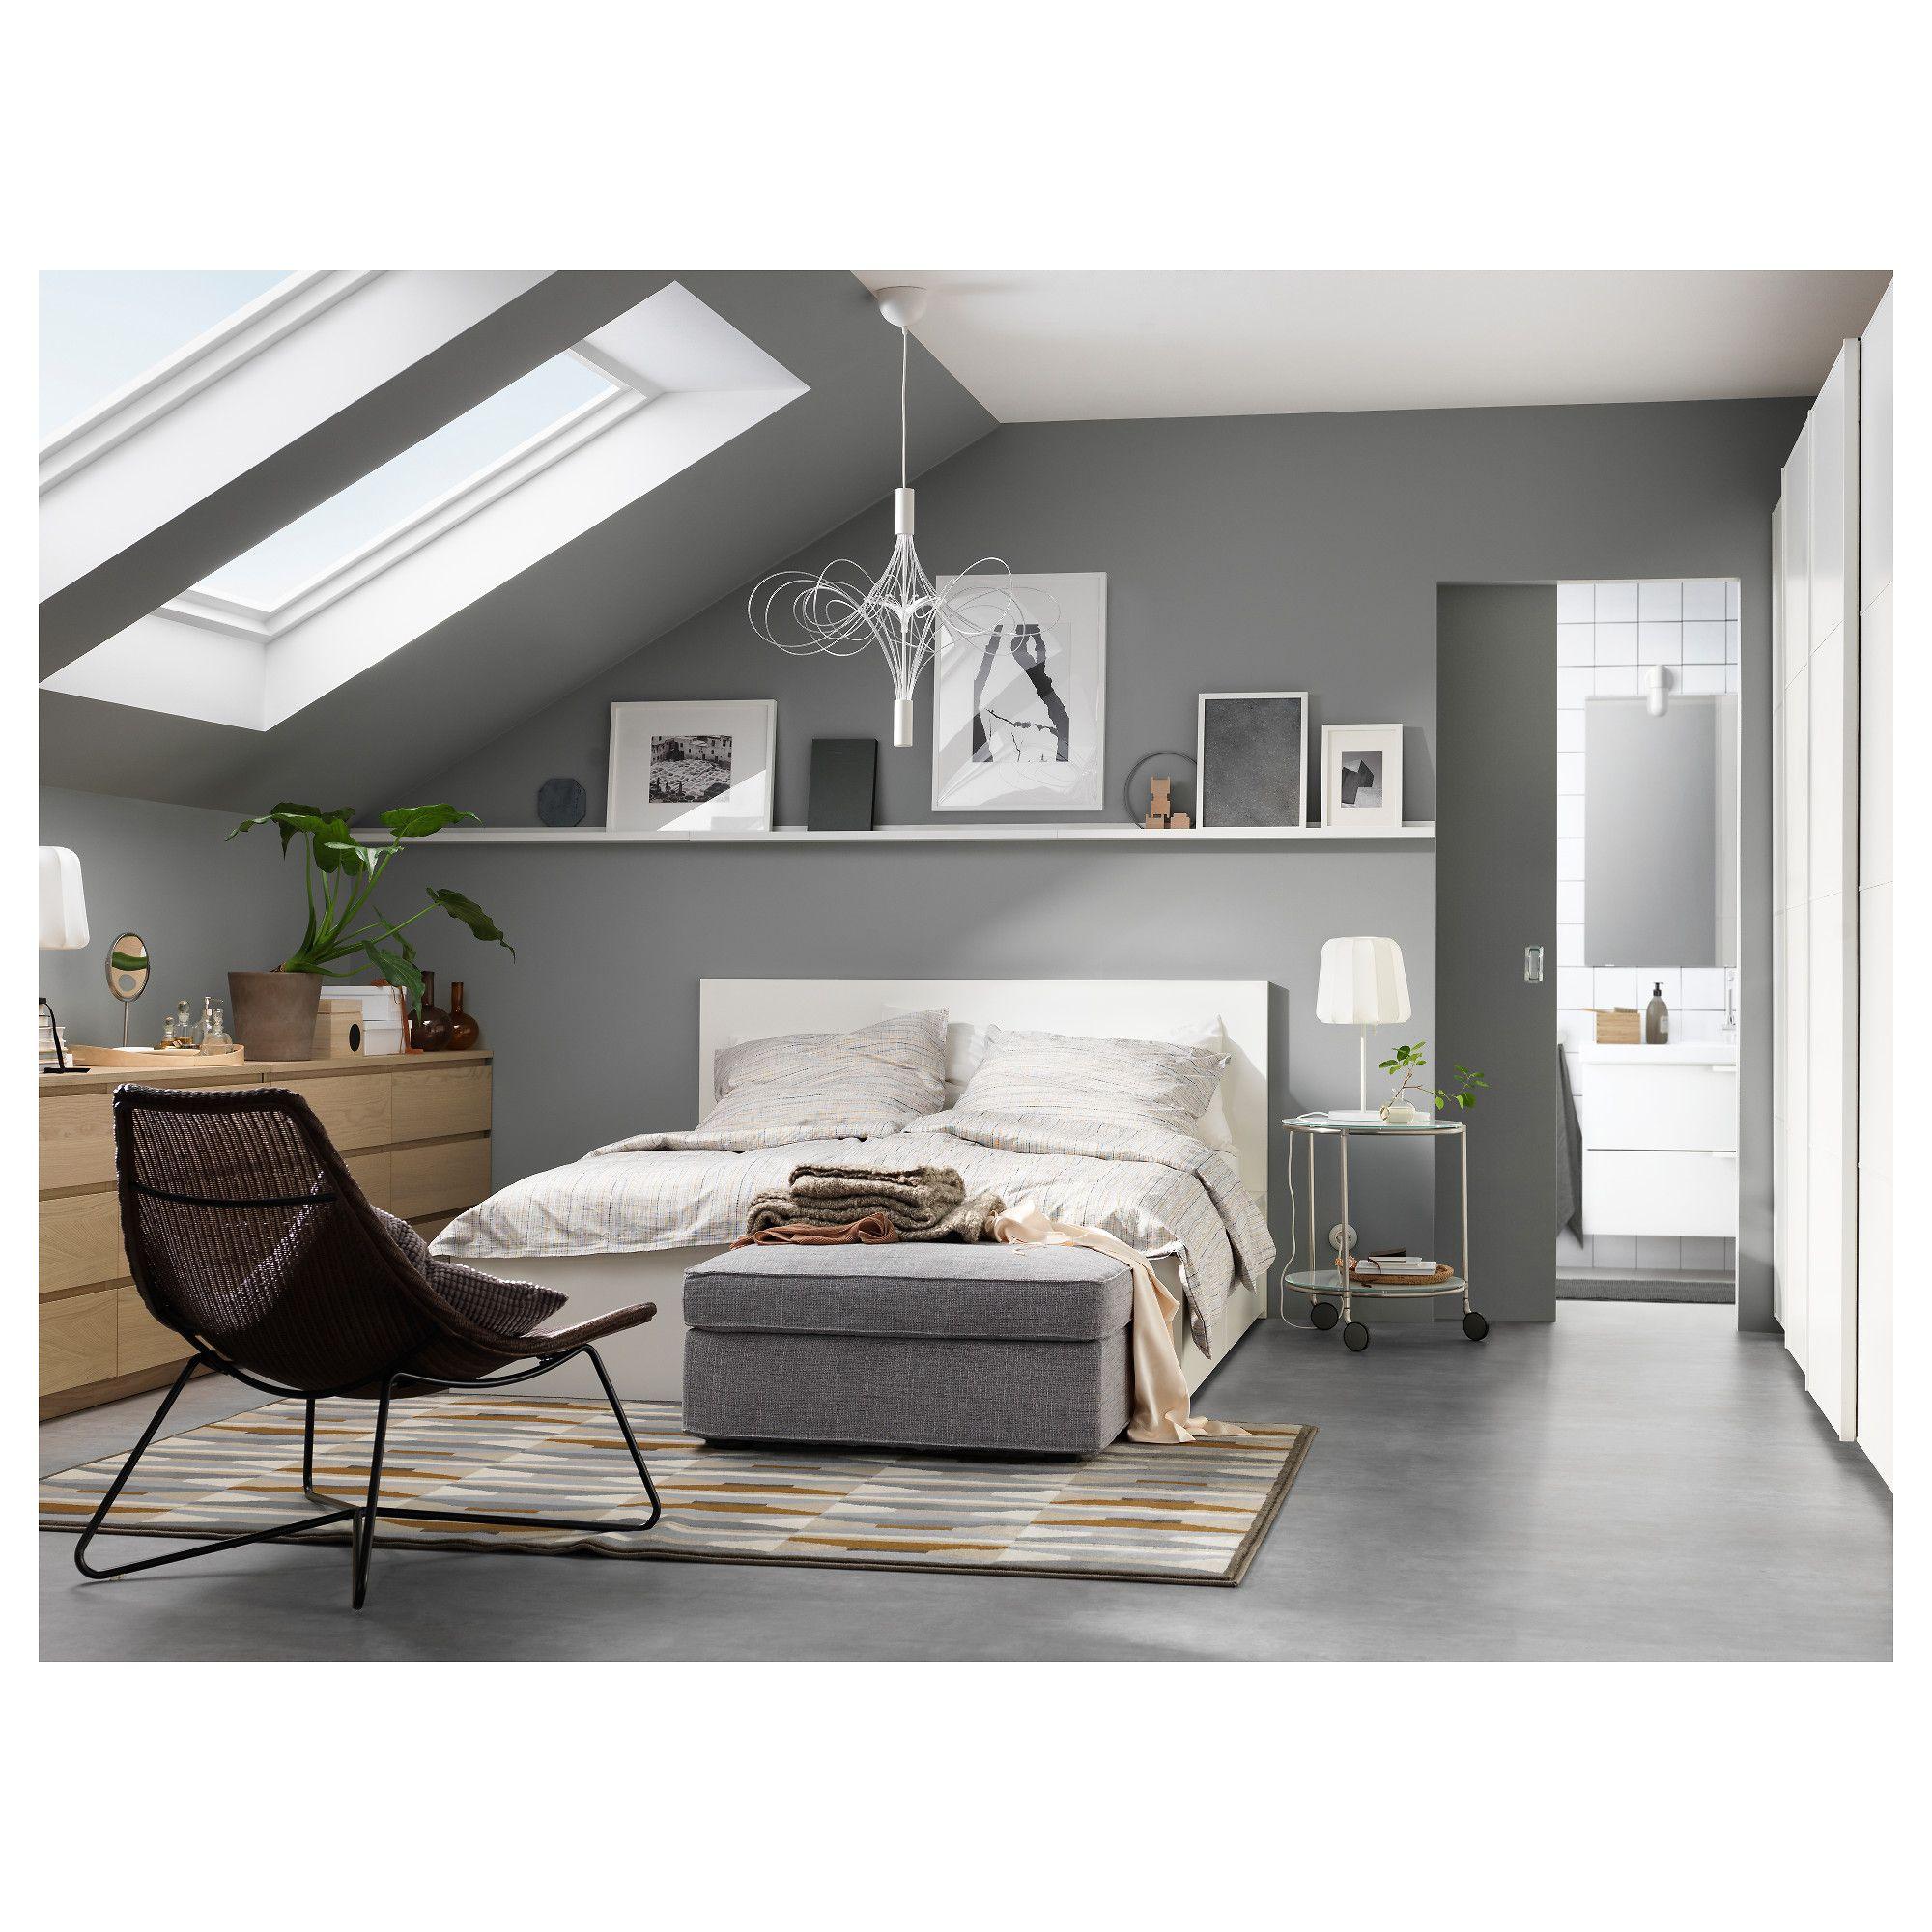 Ikea Malm High Bed Frame 2 Storage Boxes White En 2019